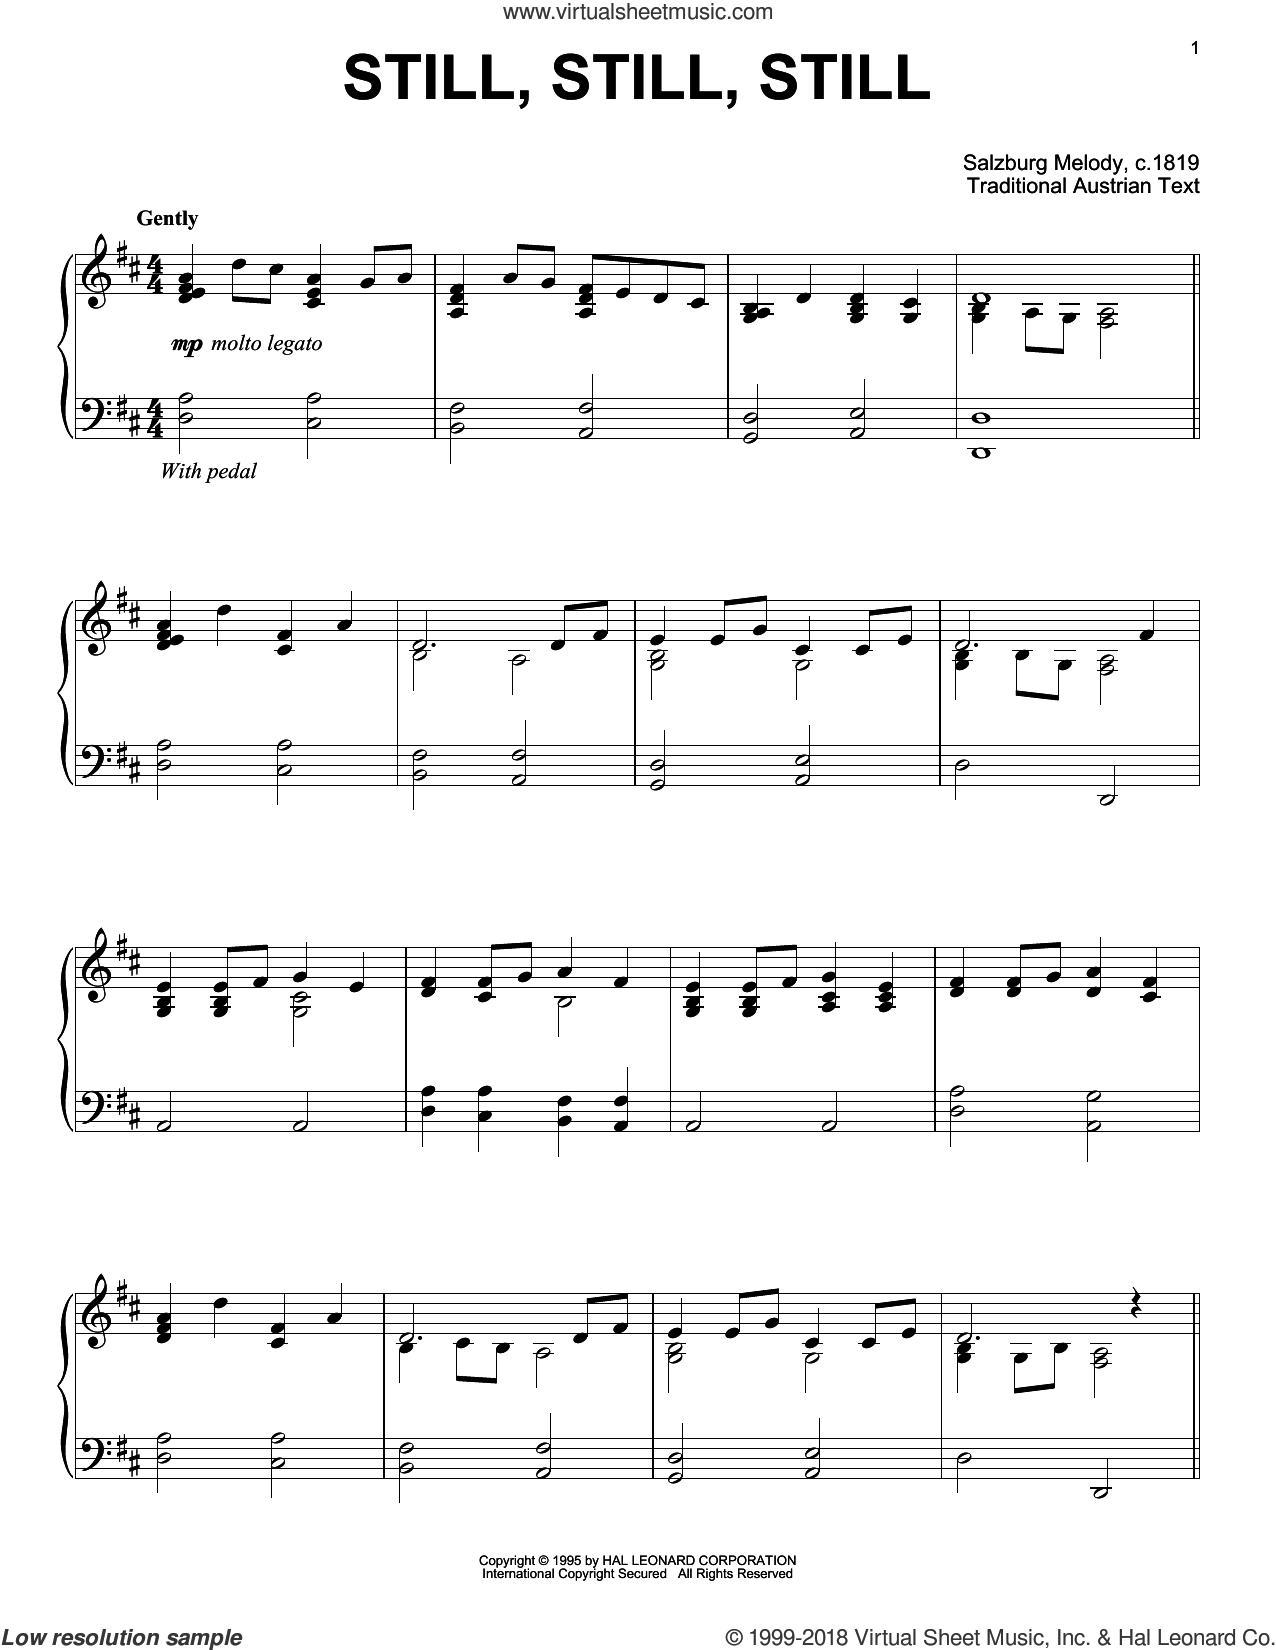 Still, Still, Still, (intermediate) sheet music for piano solo, intermediate skill level